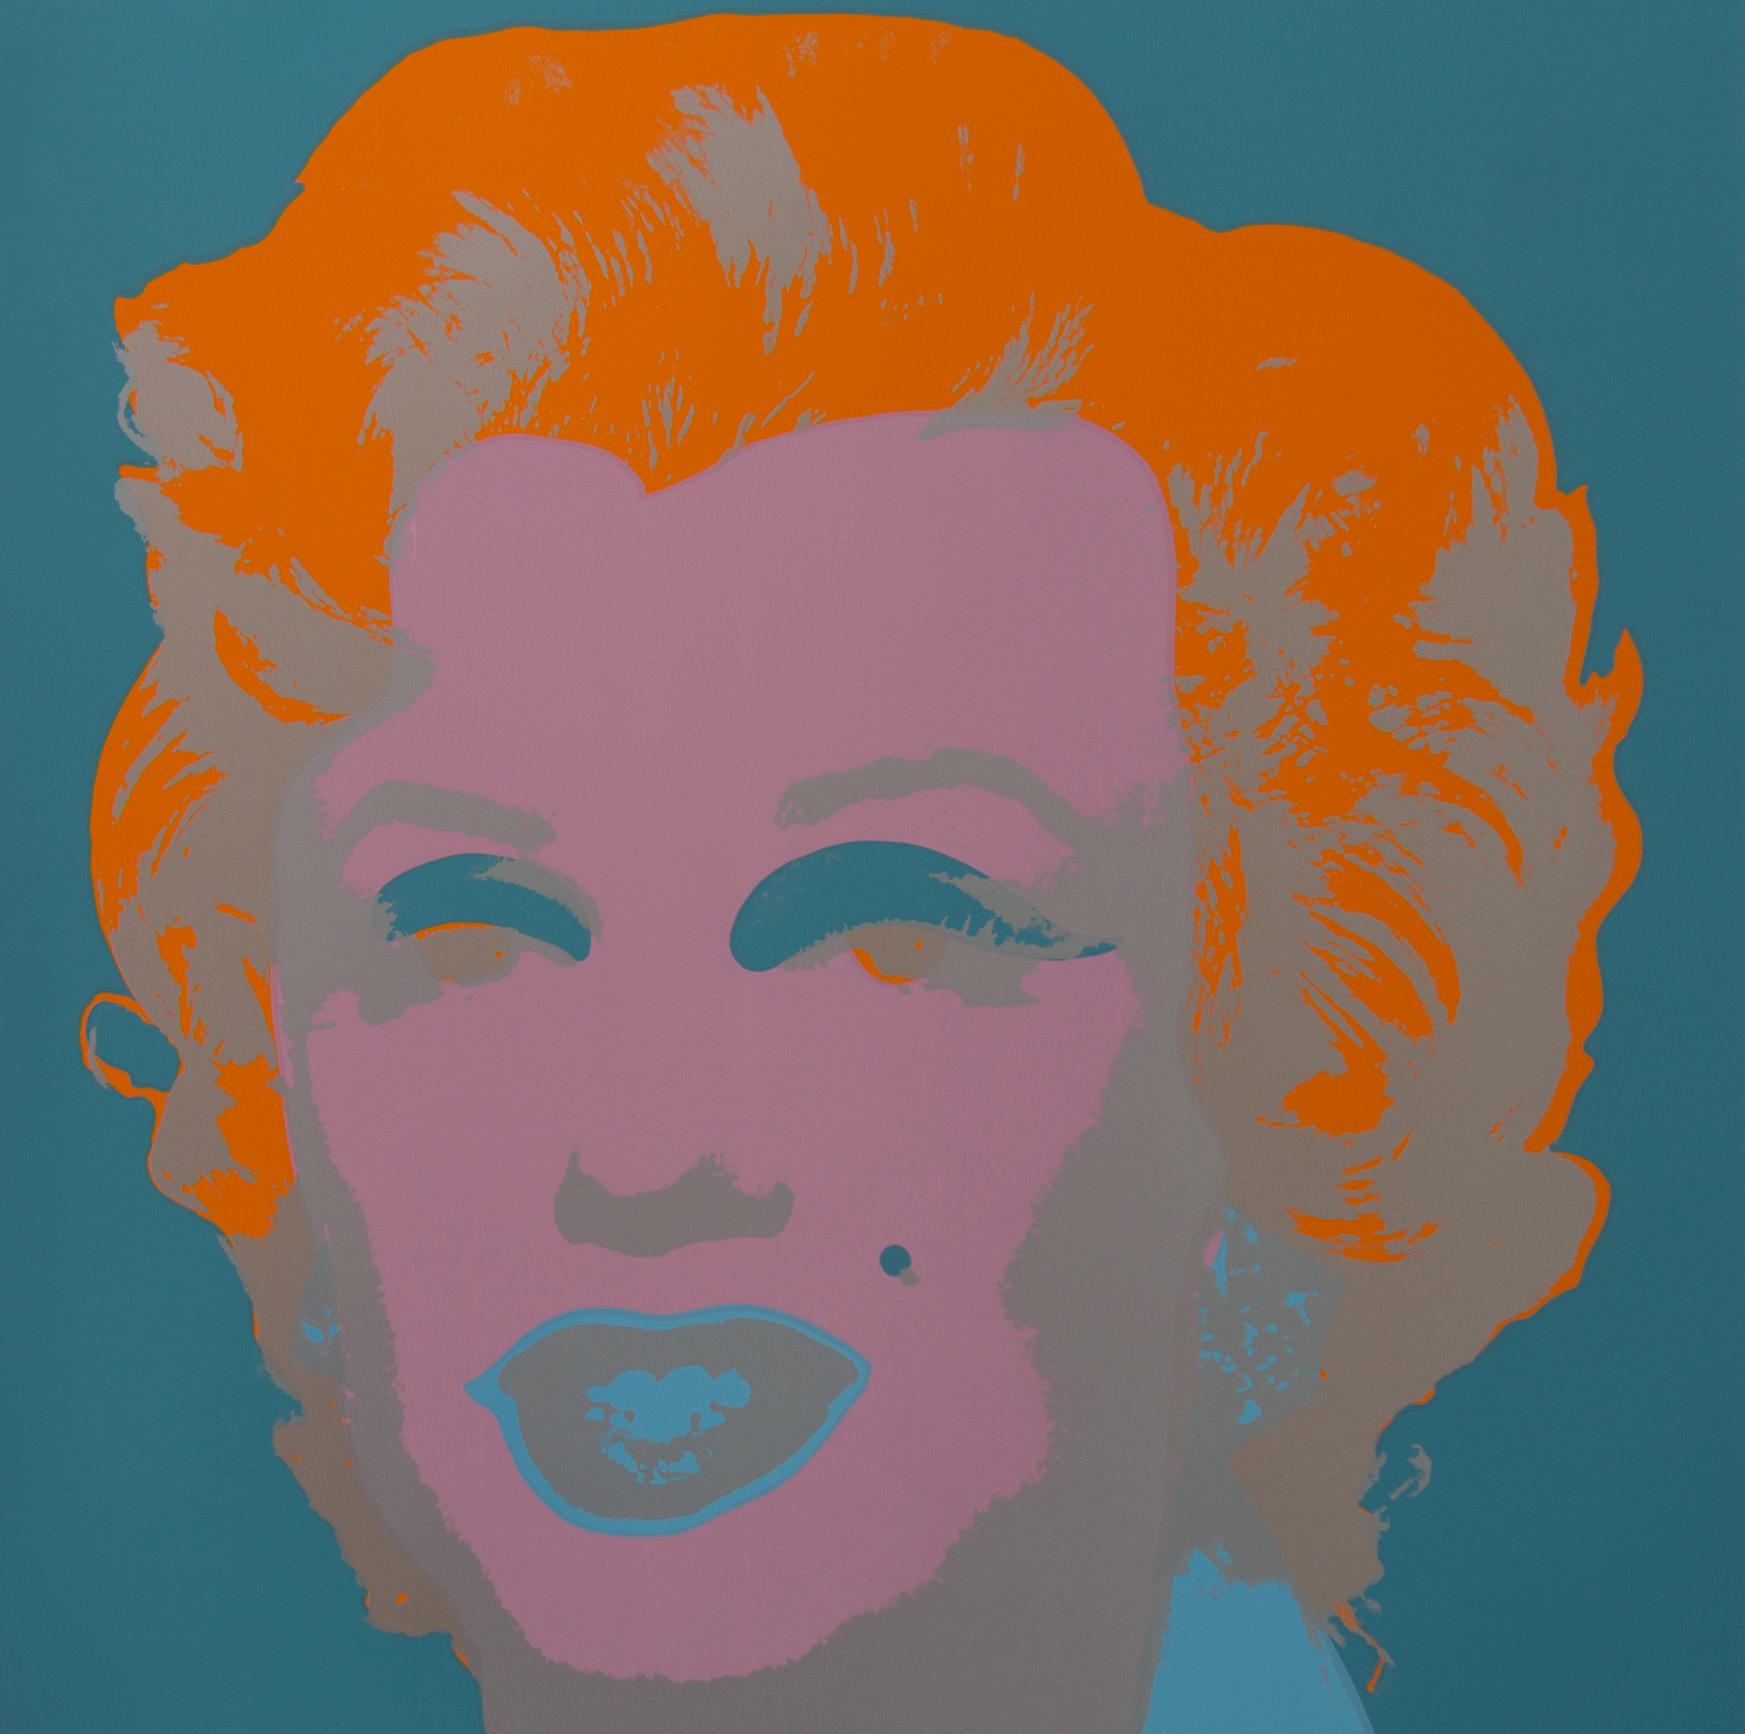 11.29: Marilyn Monroe